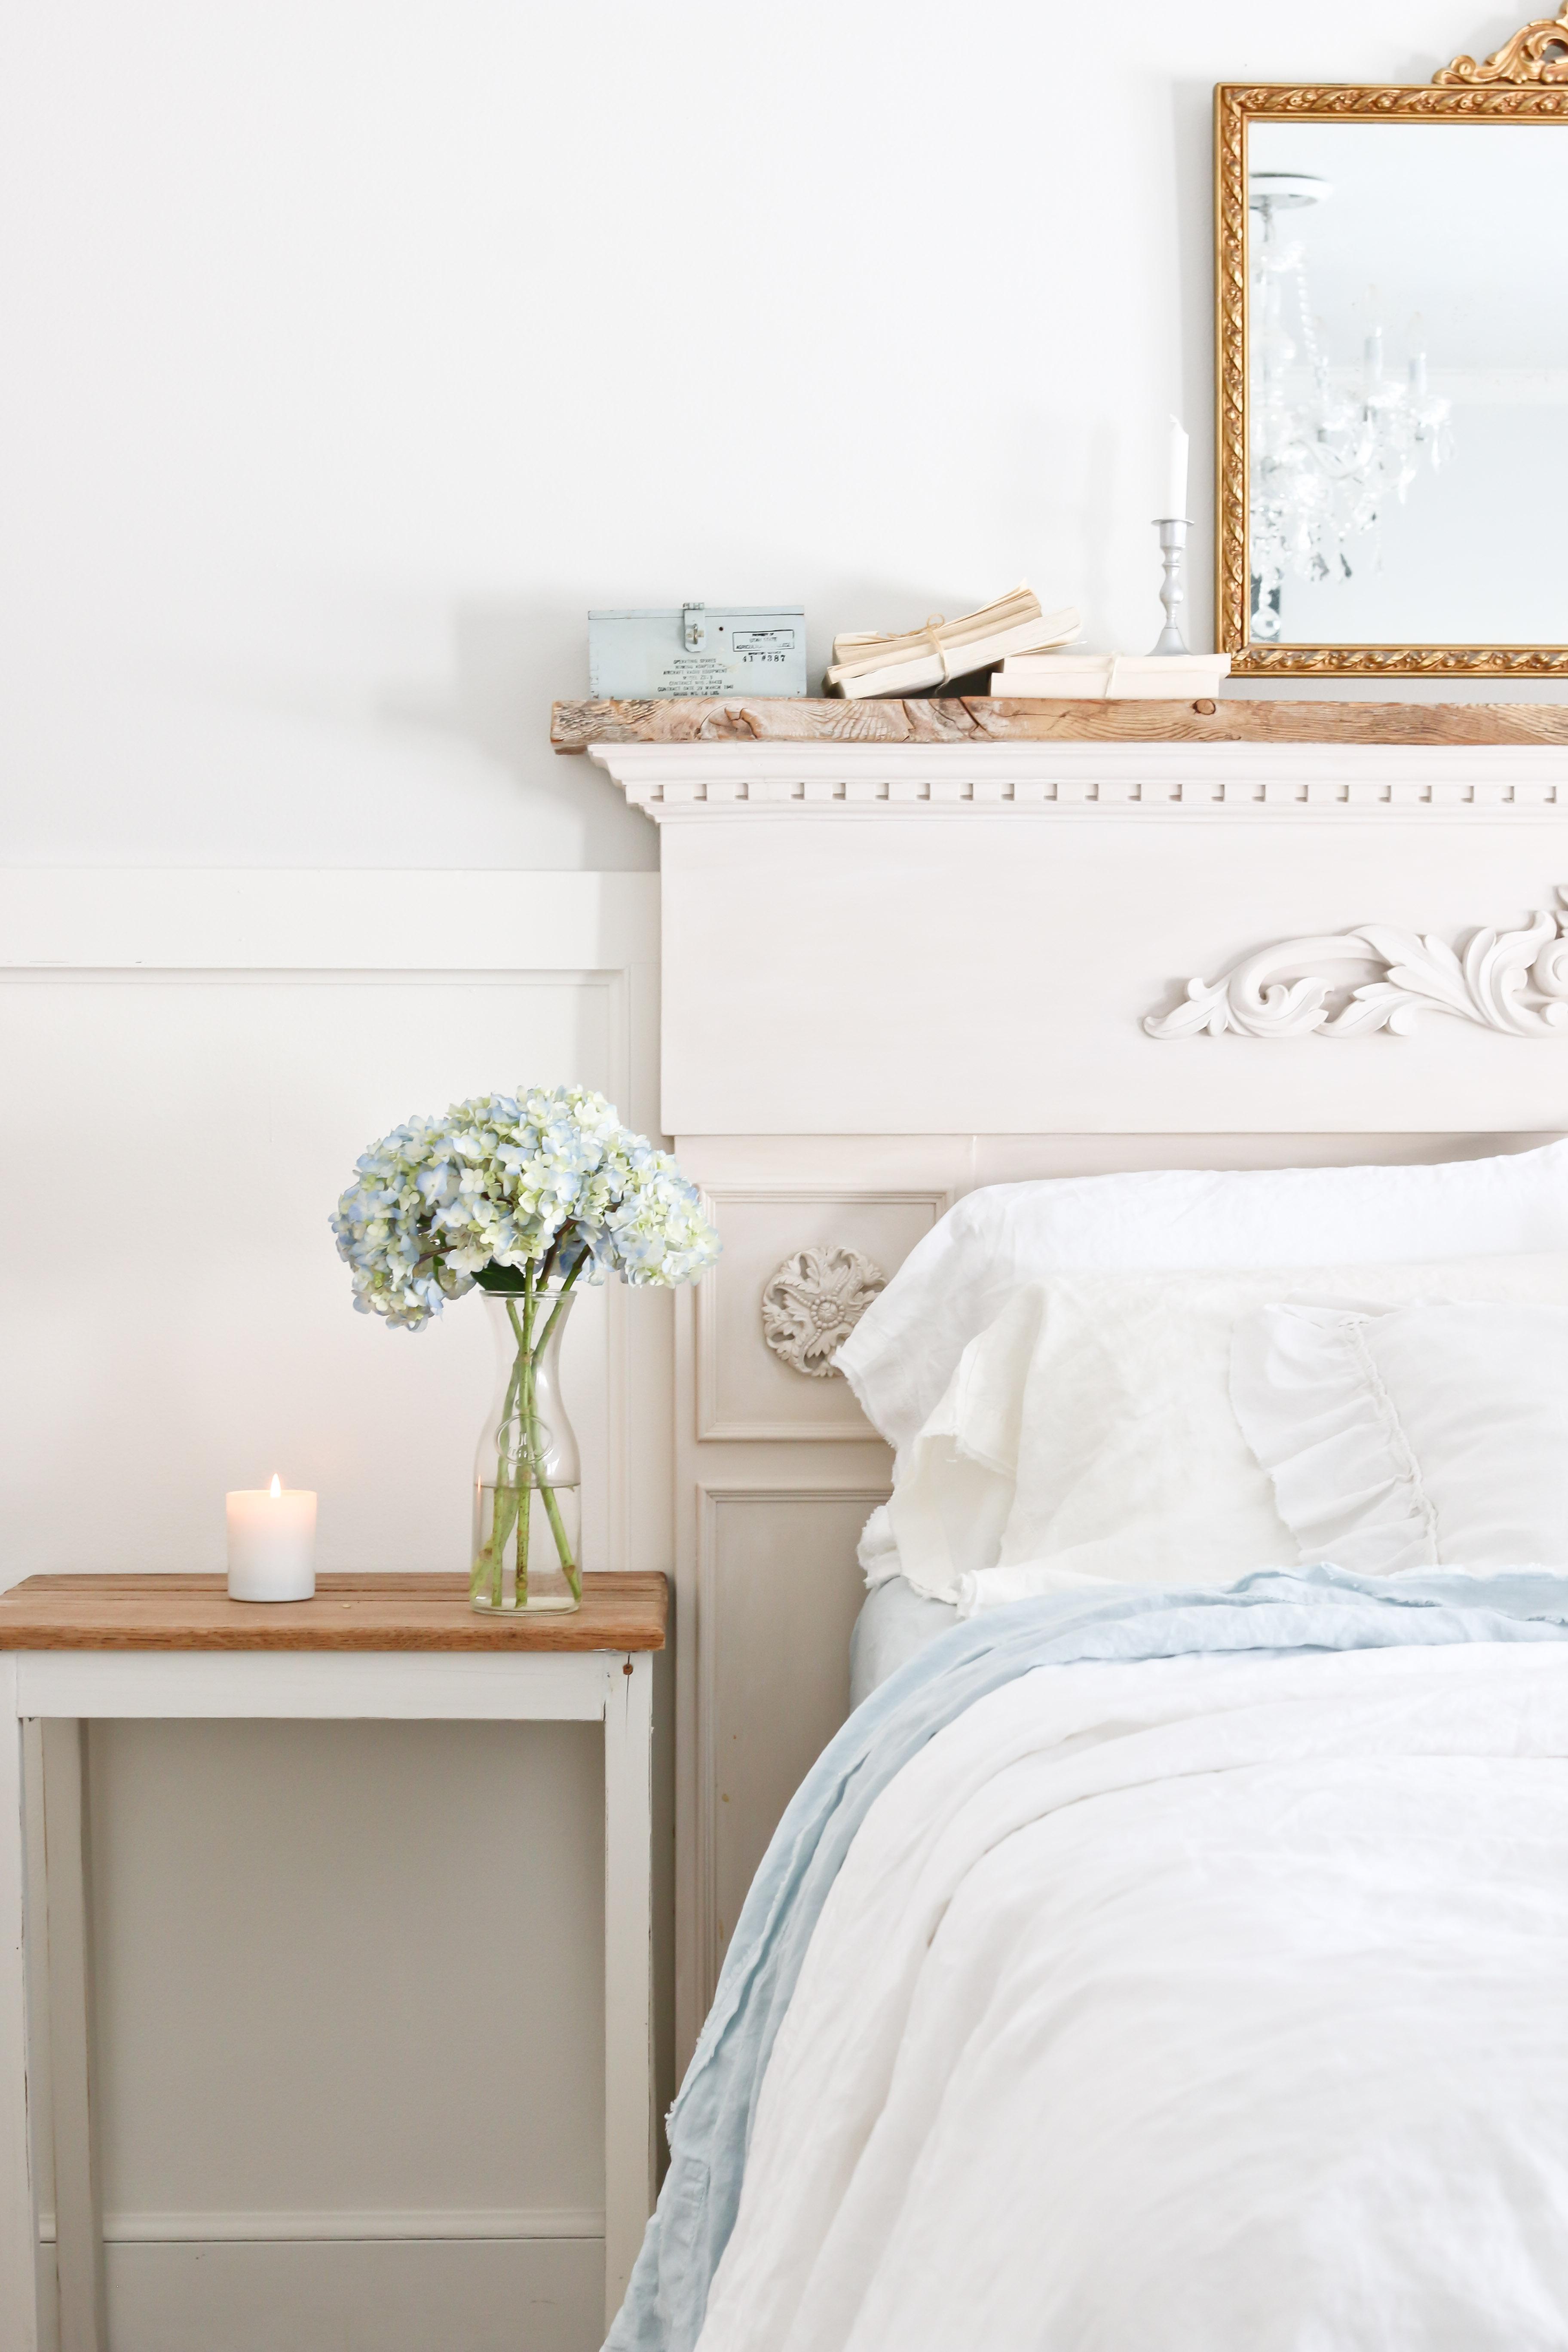 Spring Bedroom Tour Linen Sheets-51